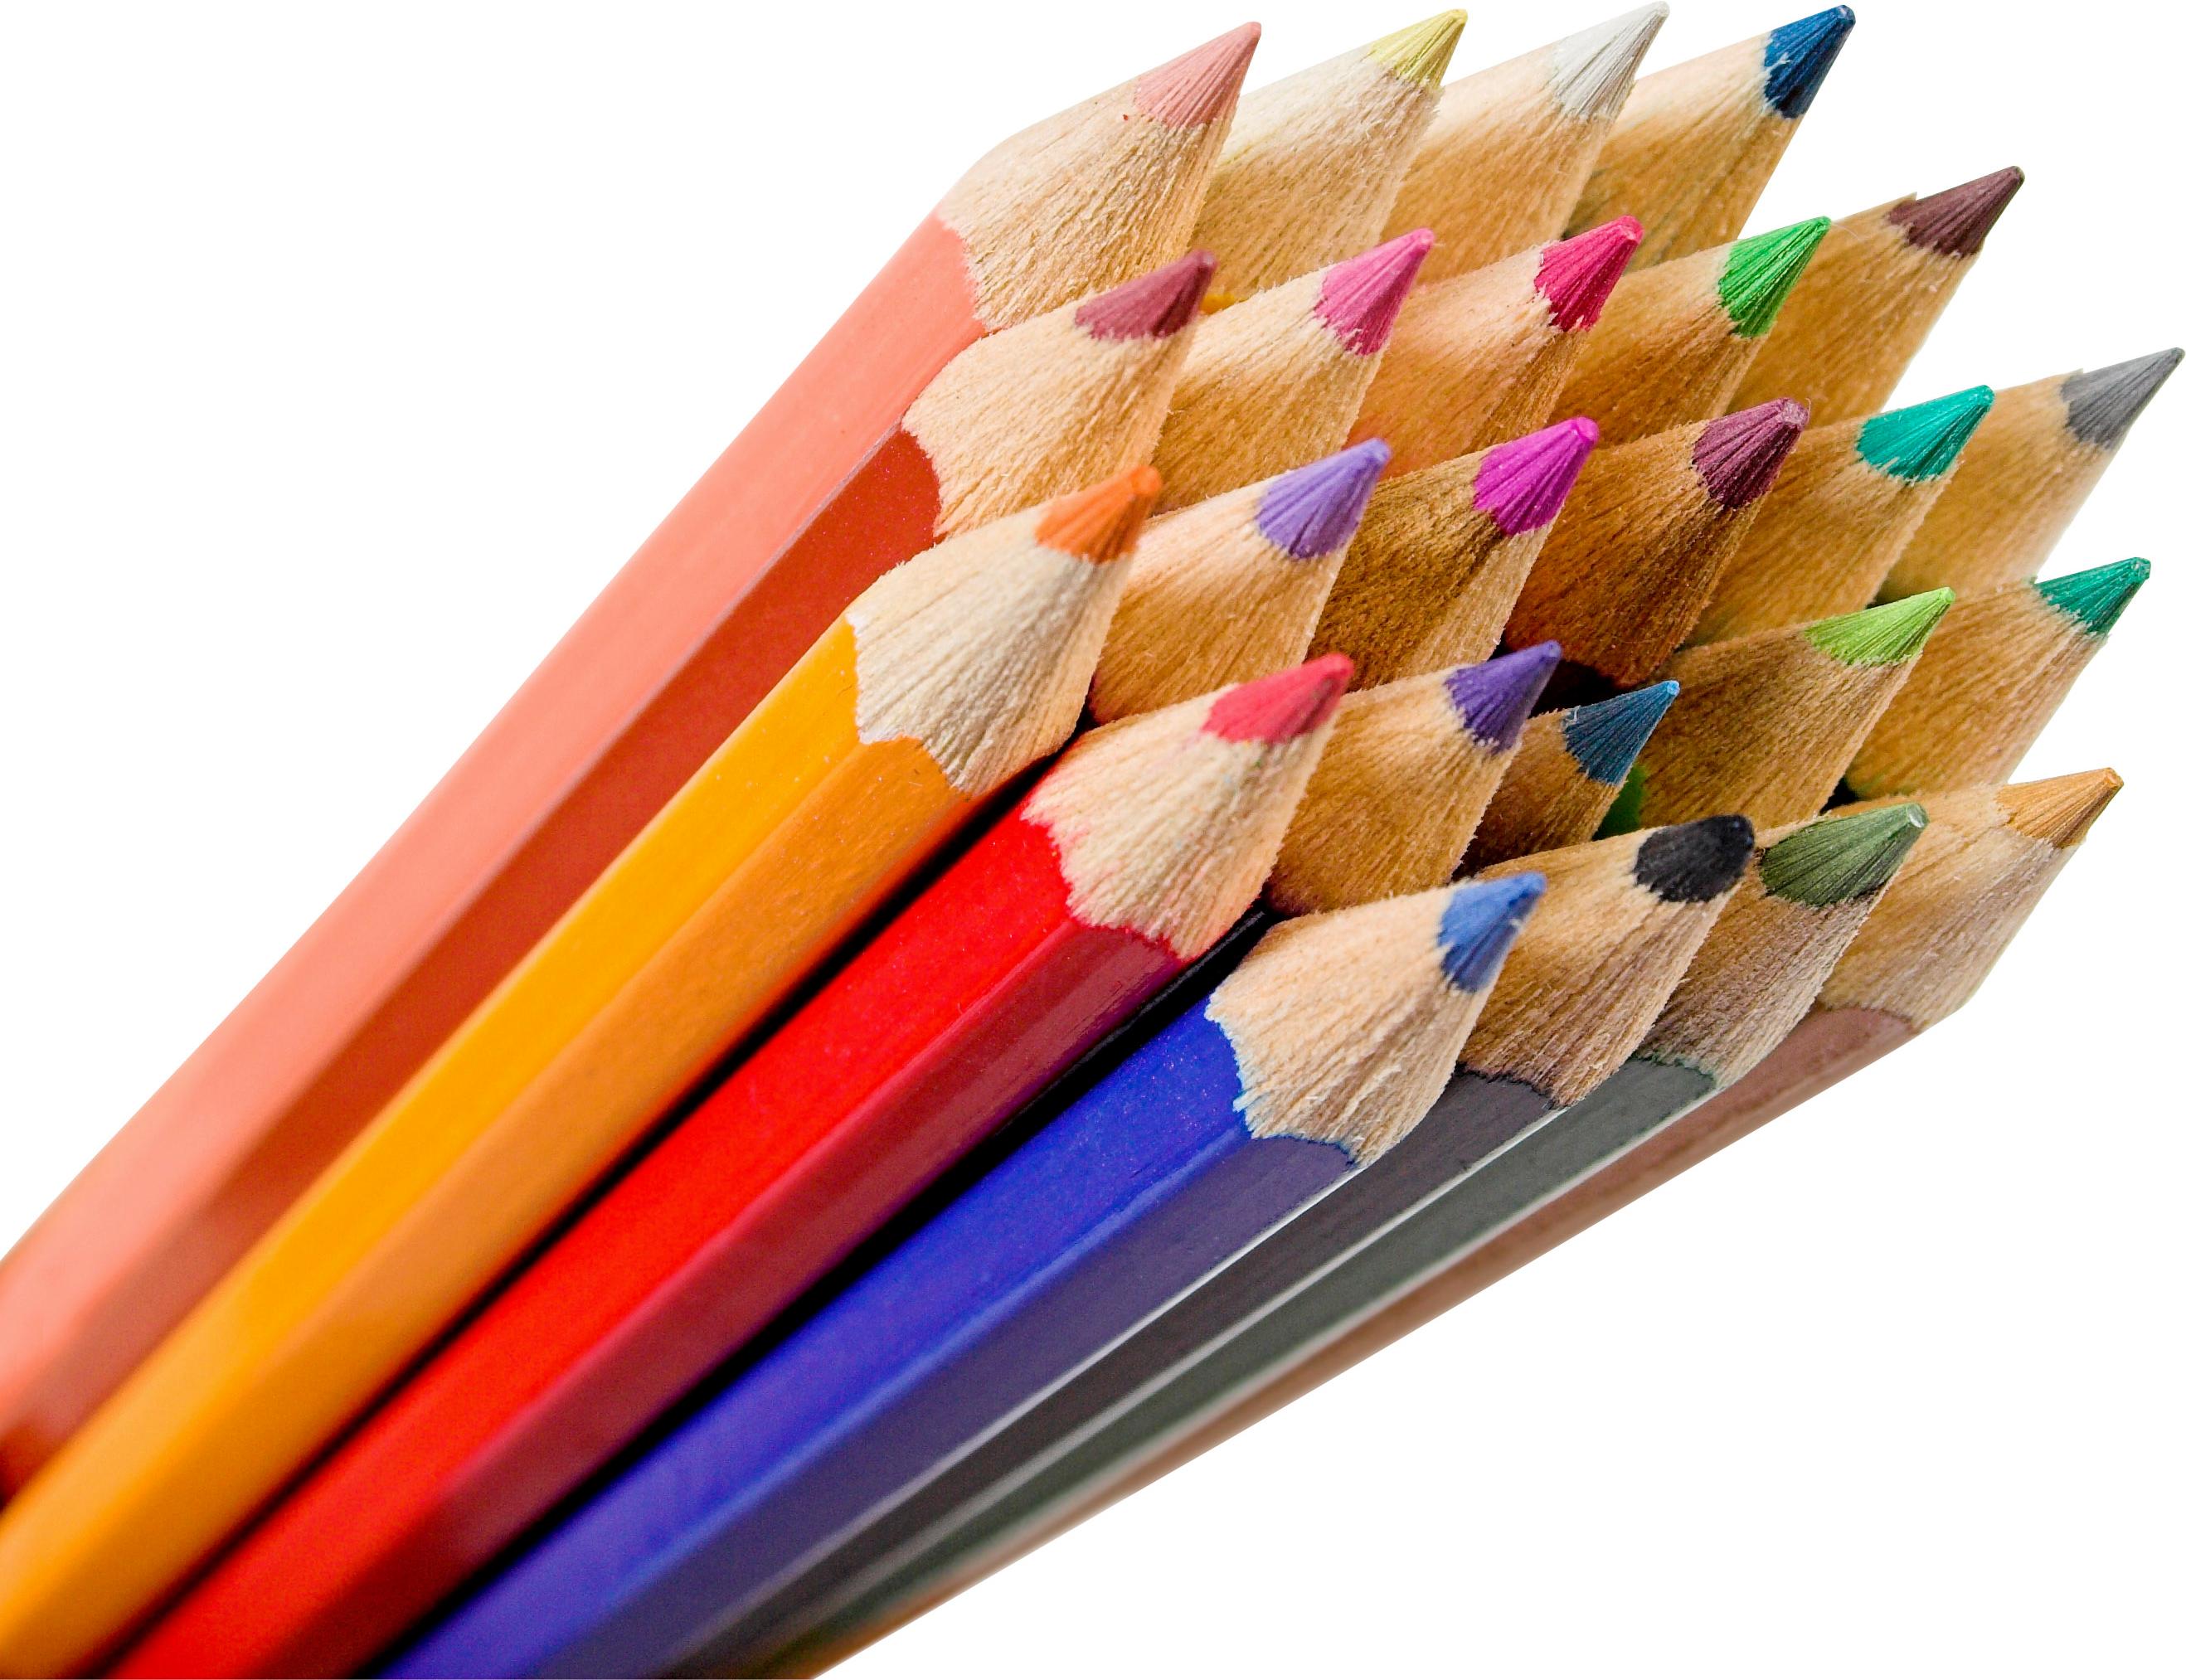 Colorful pencils PNG image - Pencil HD PNG